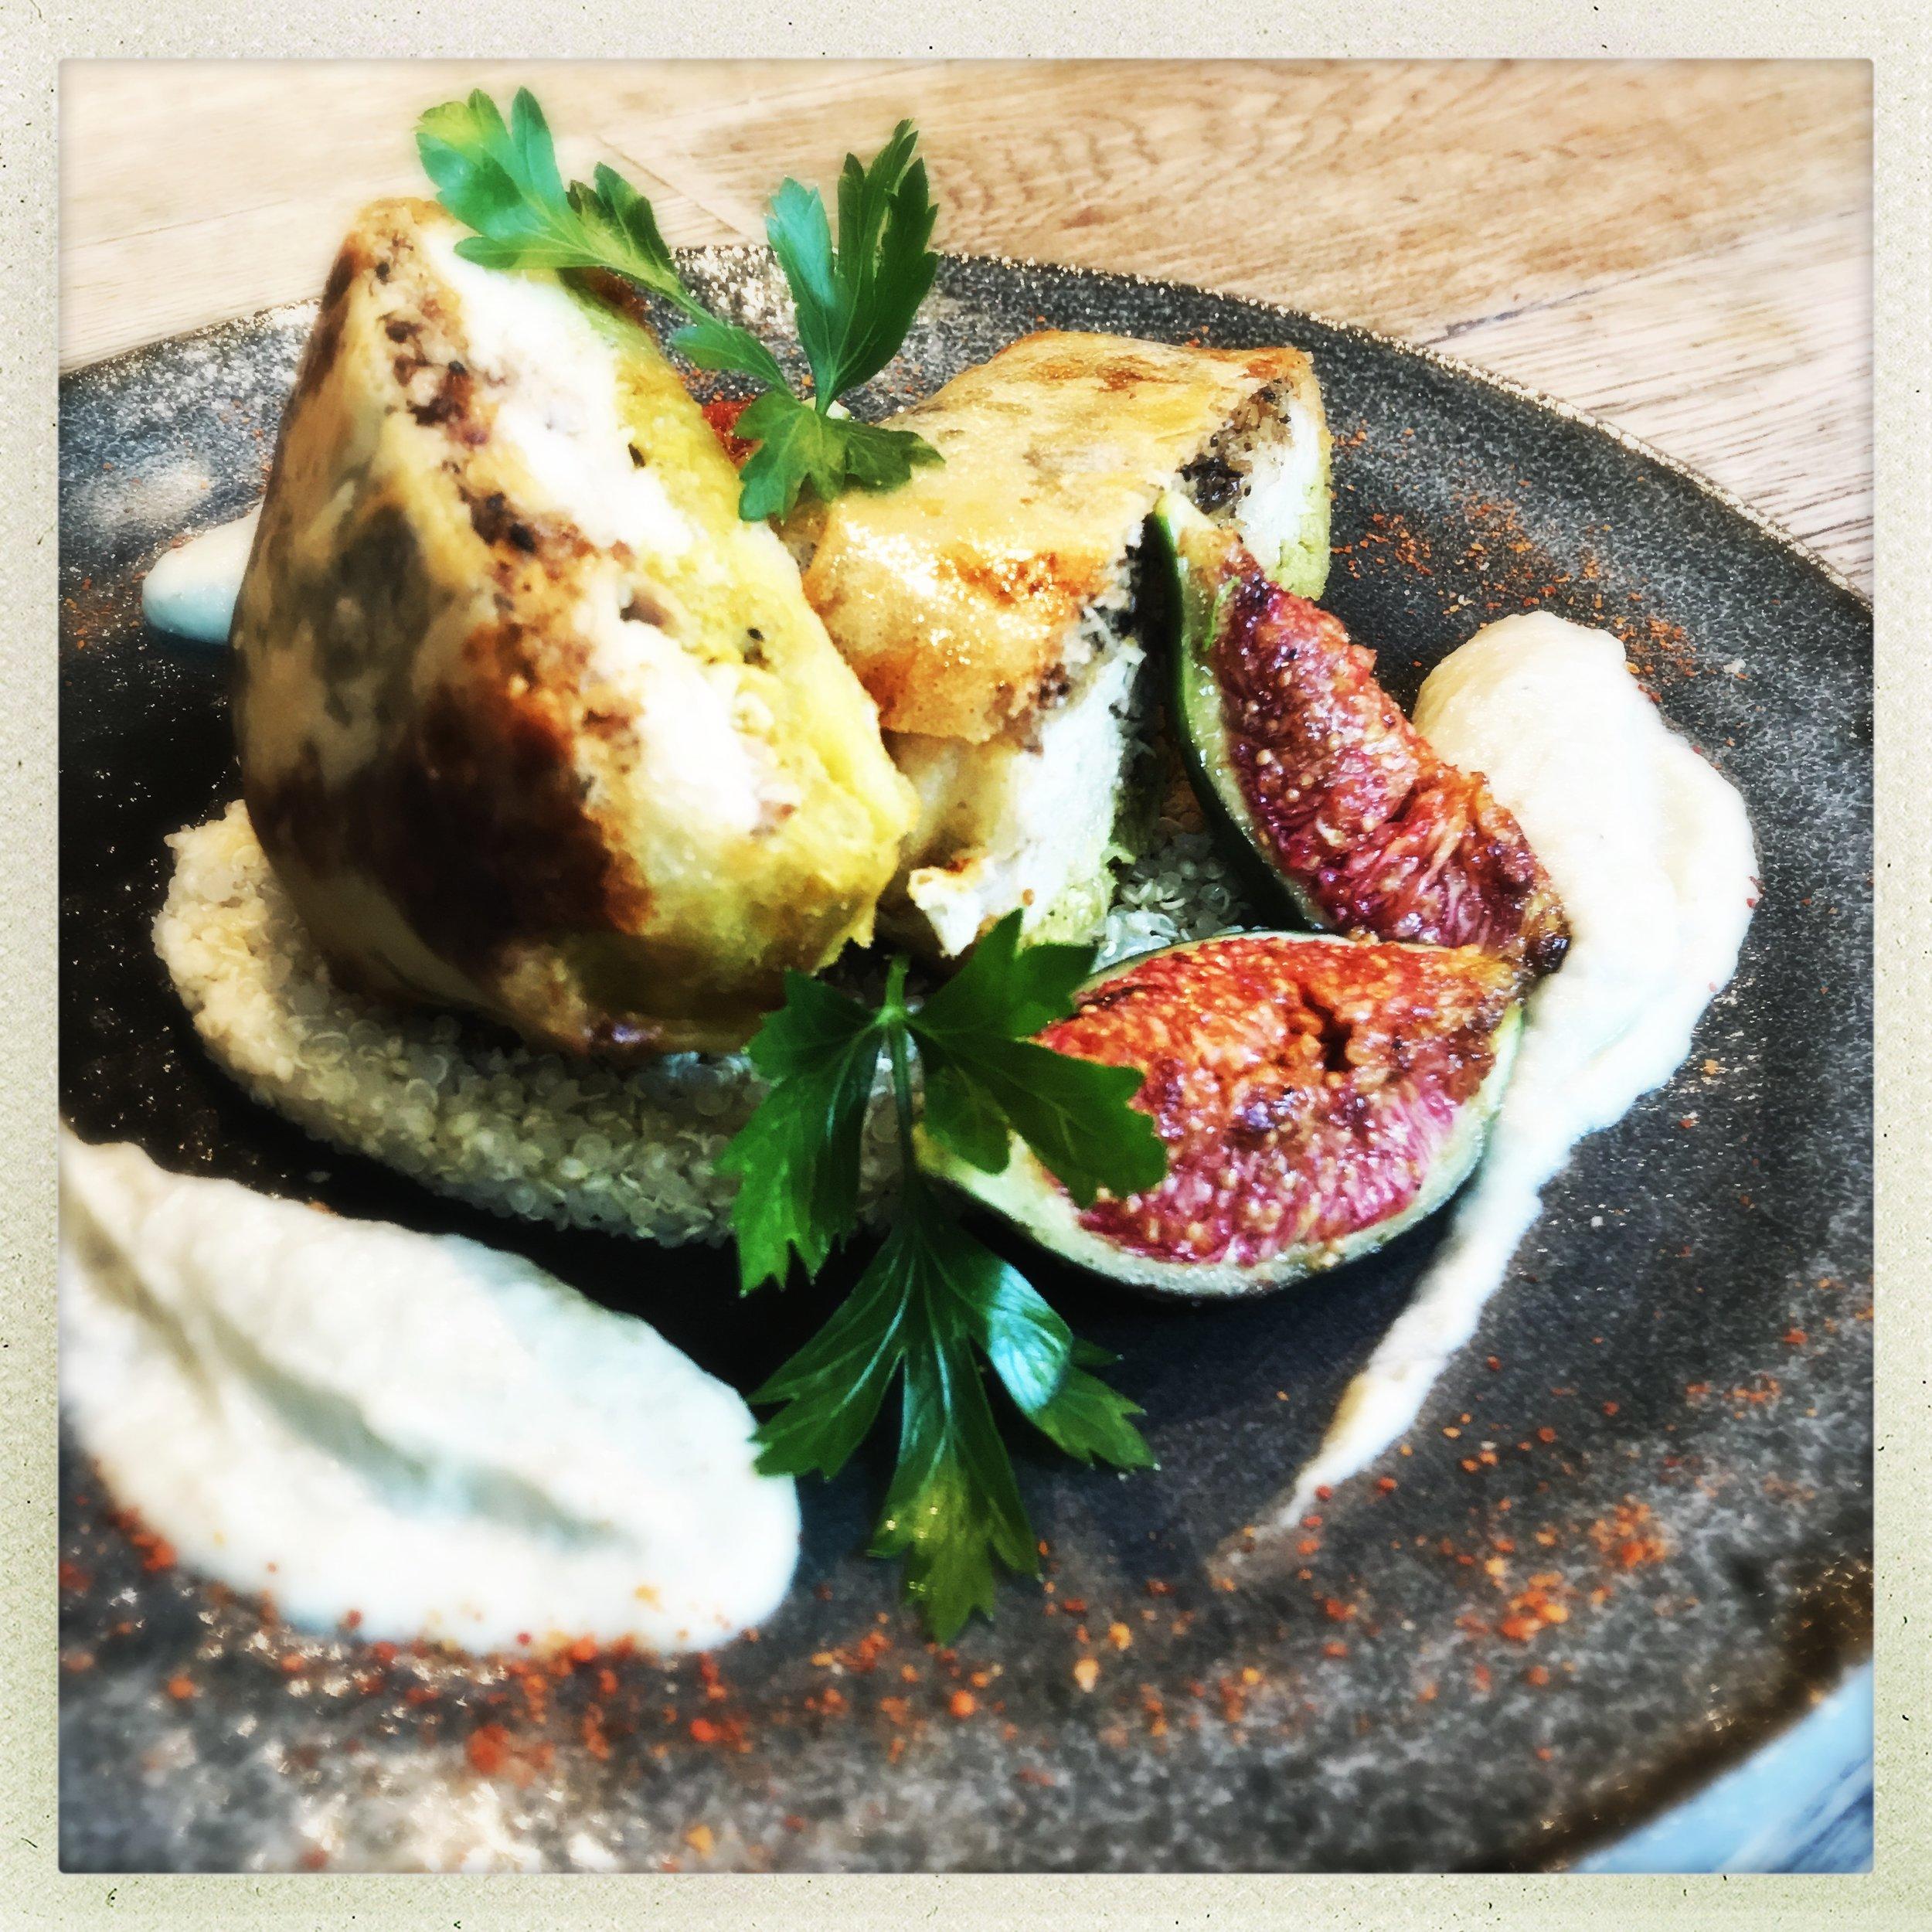 katrepices-restaurant-geneve-platdujou-coursdecuisine-baravin3.jpg